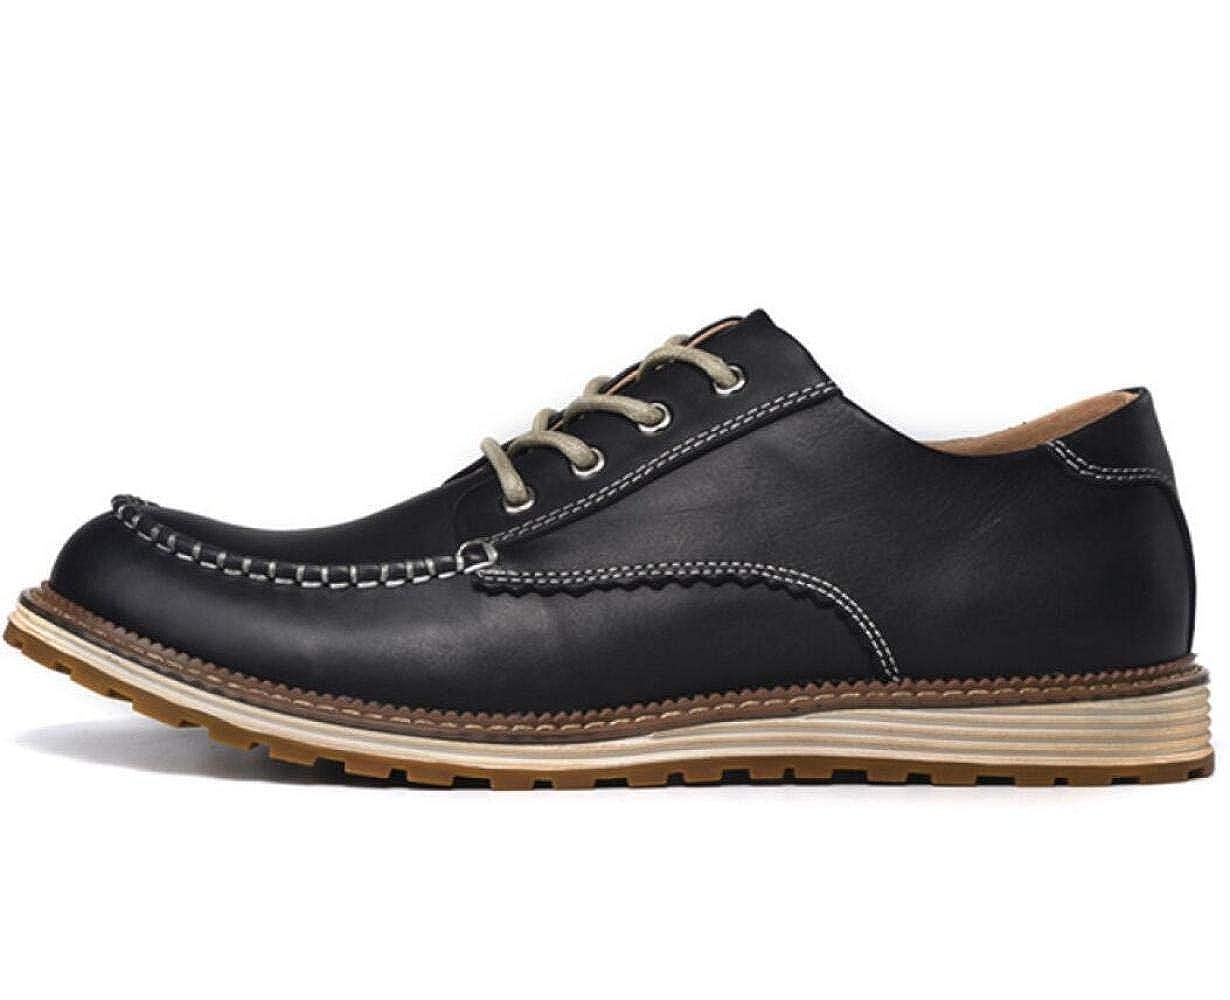 DHFUD Herrenschuhe Herren-Casual-Schuhe Retro-Niedrig-Lederschuhe Lederschuhe Für Männer